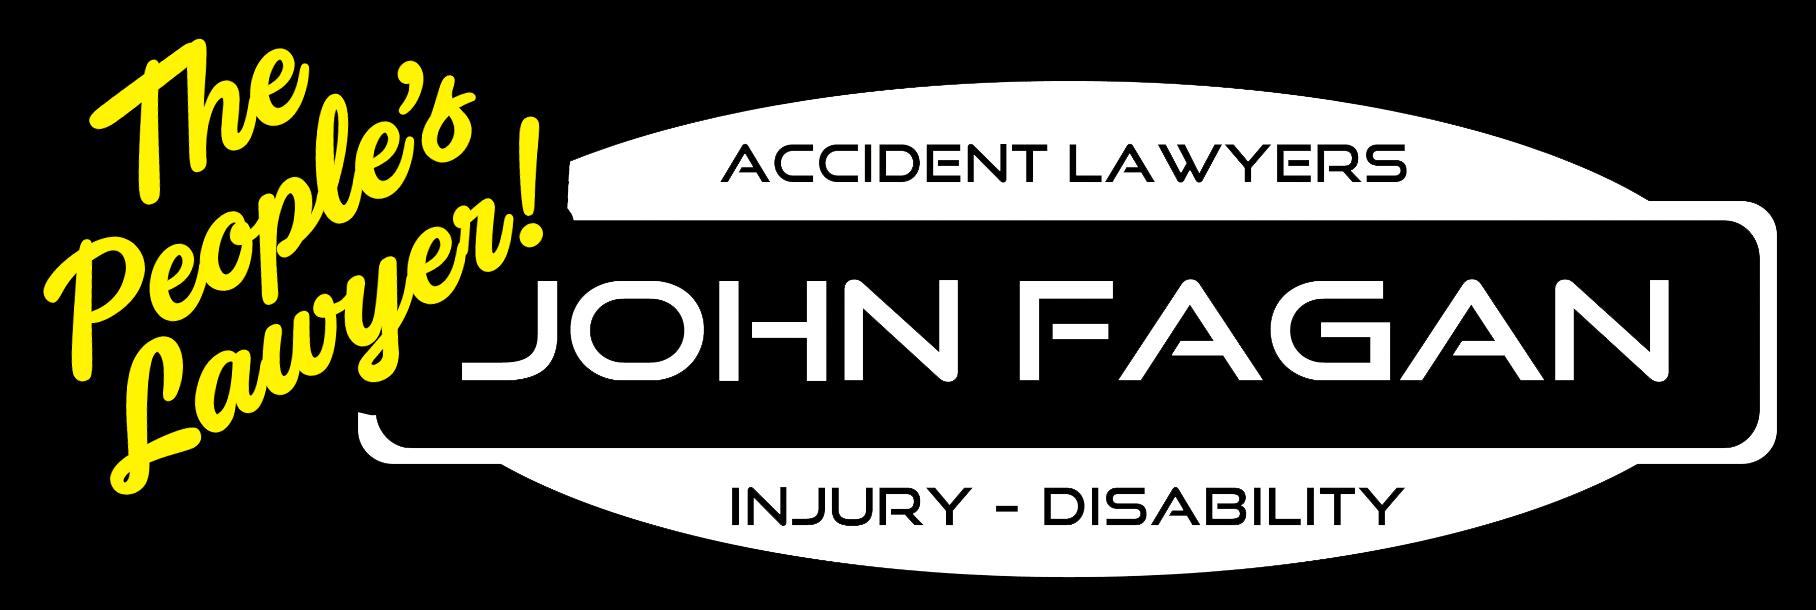 Accident Lawyer John Fagan